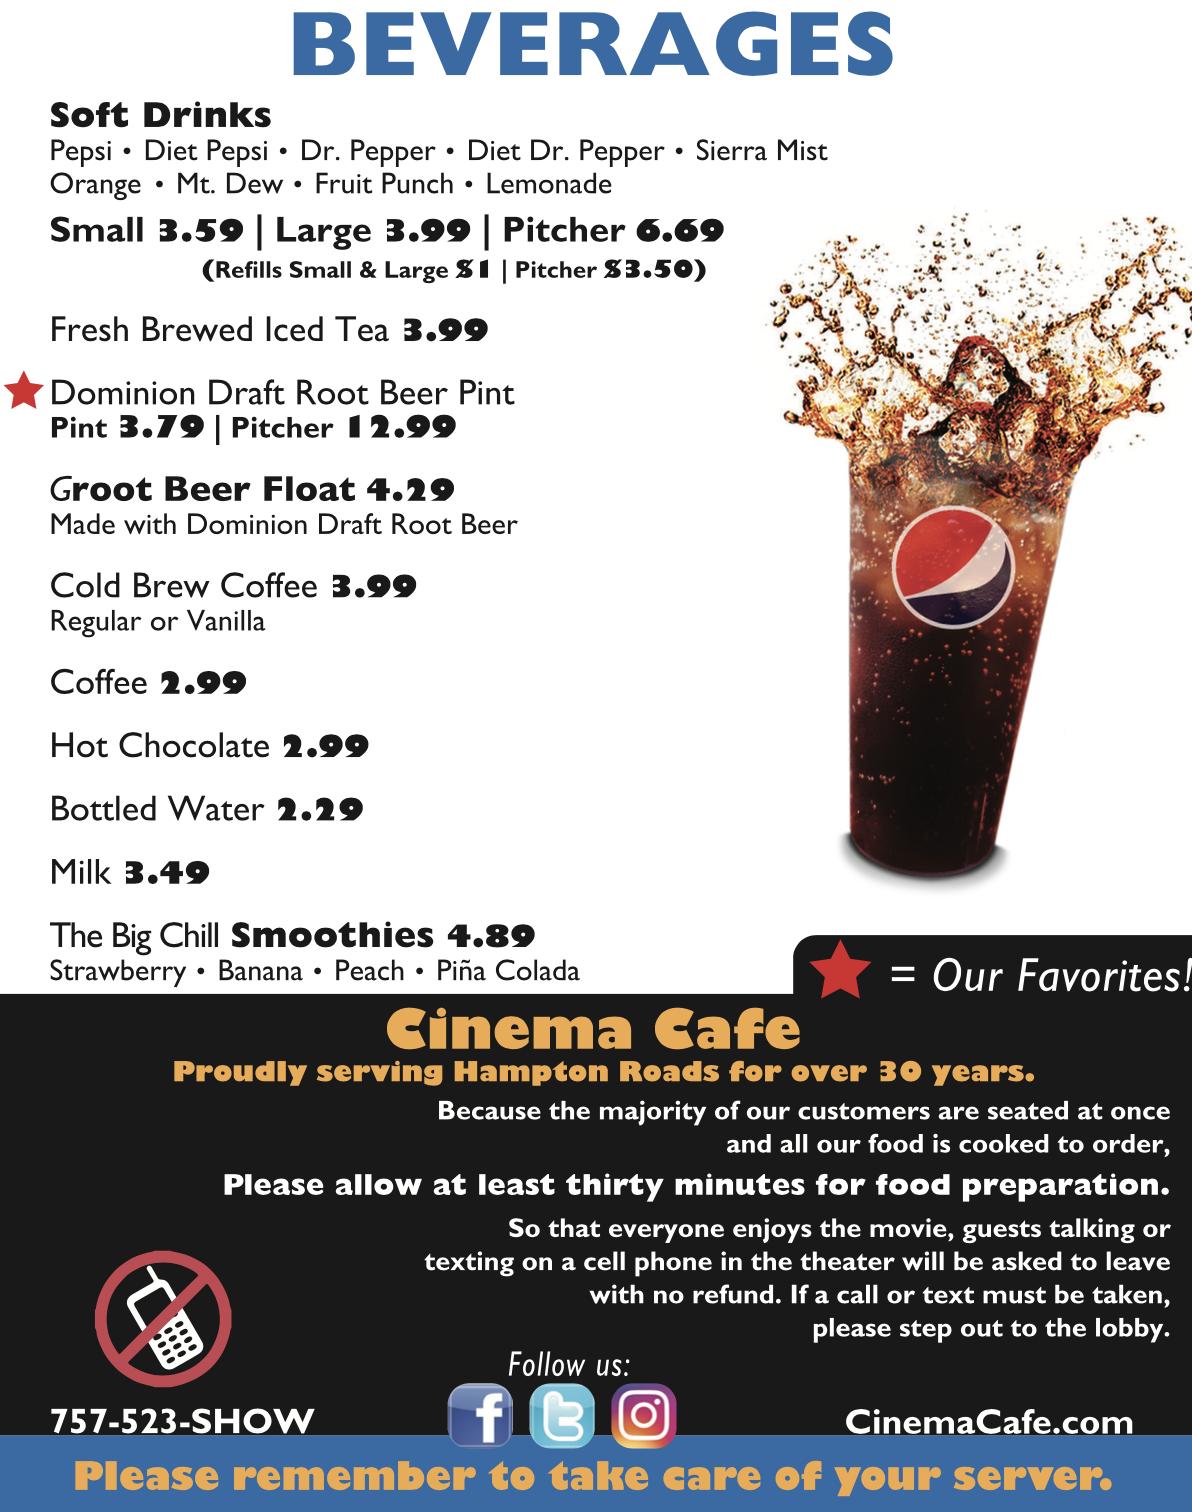 cinema cafe - kemps river premier virginia beach va